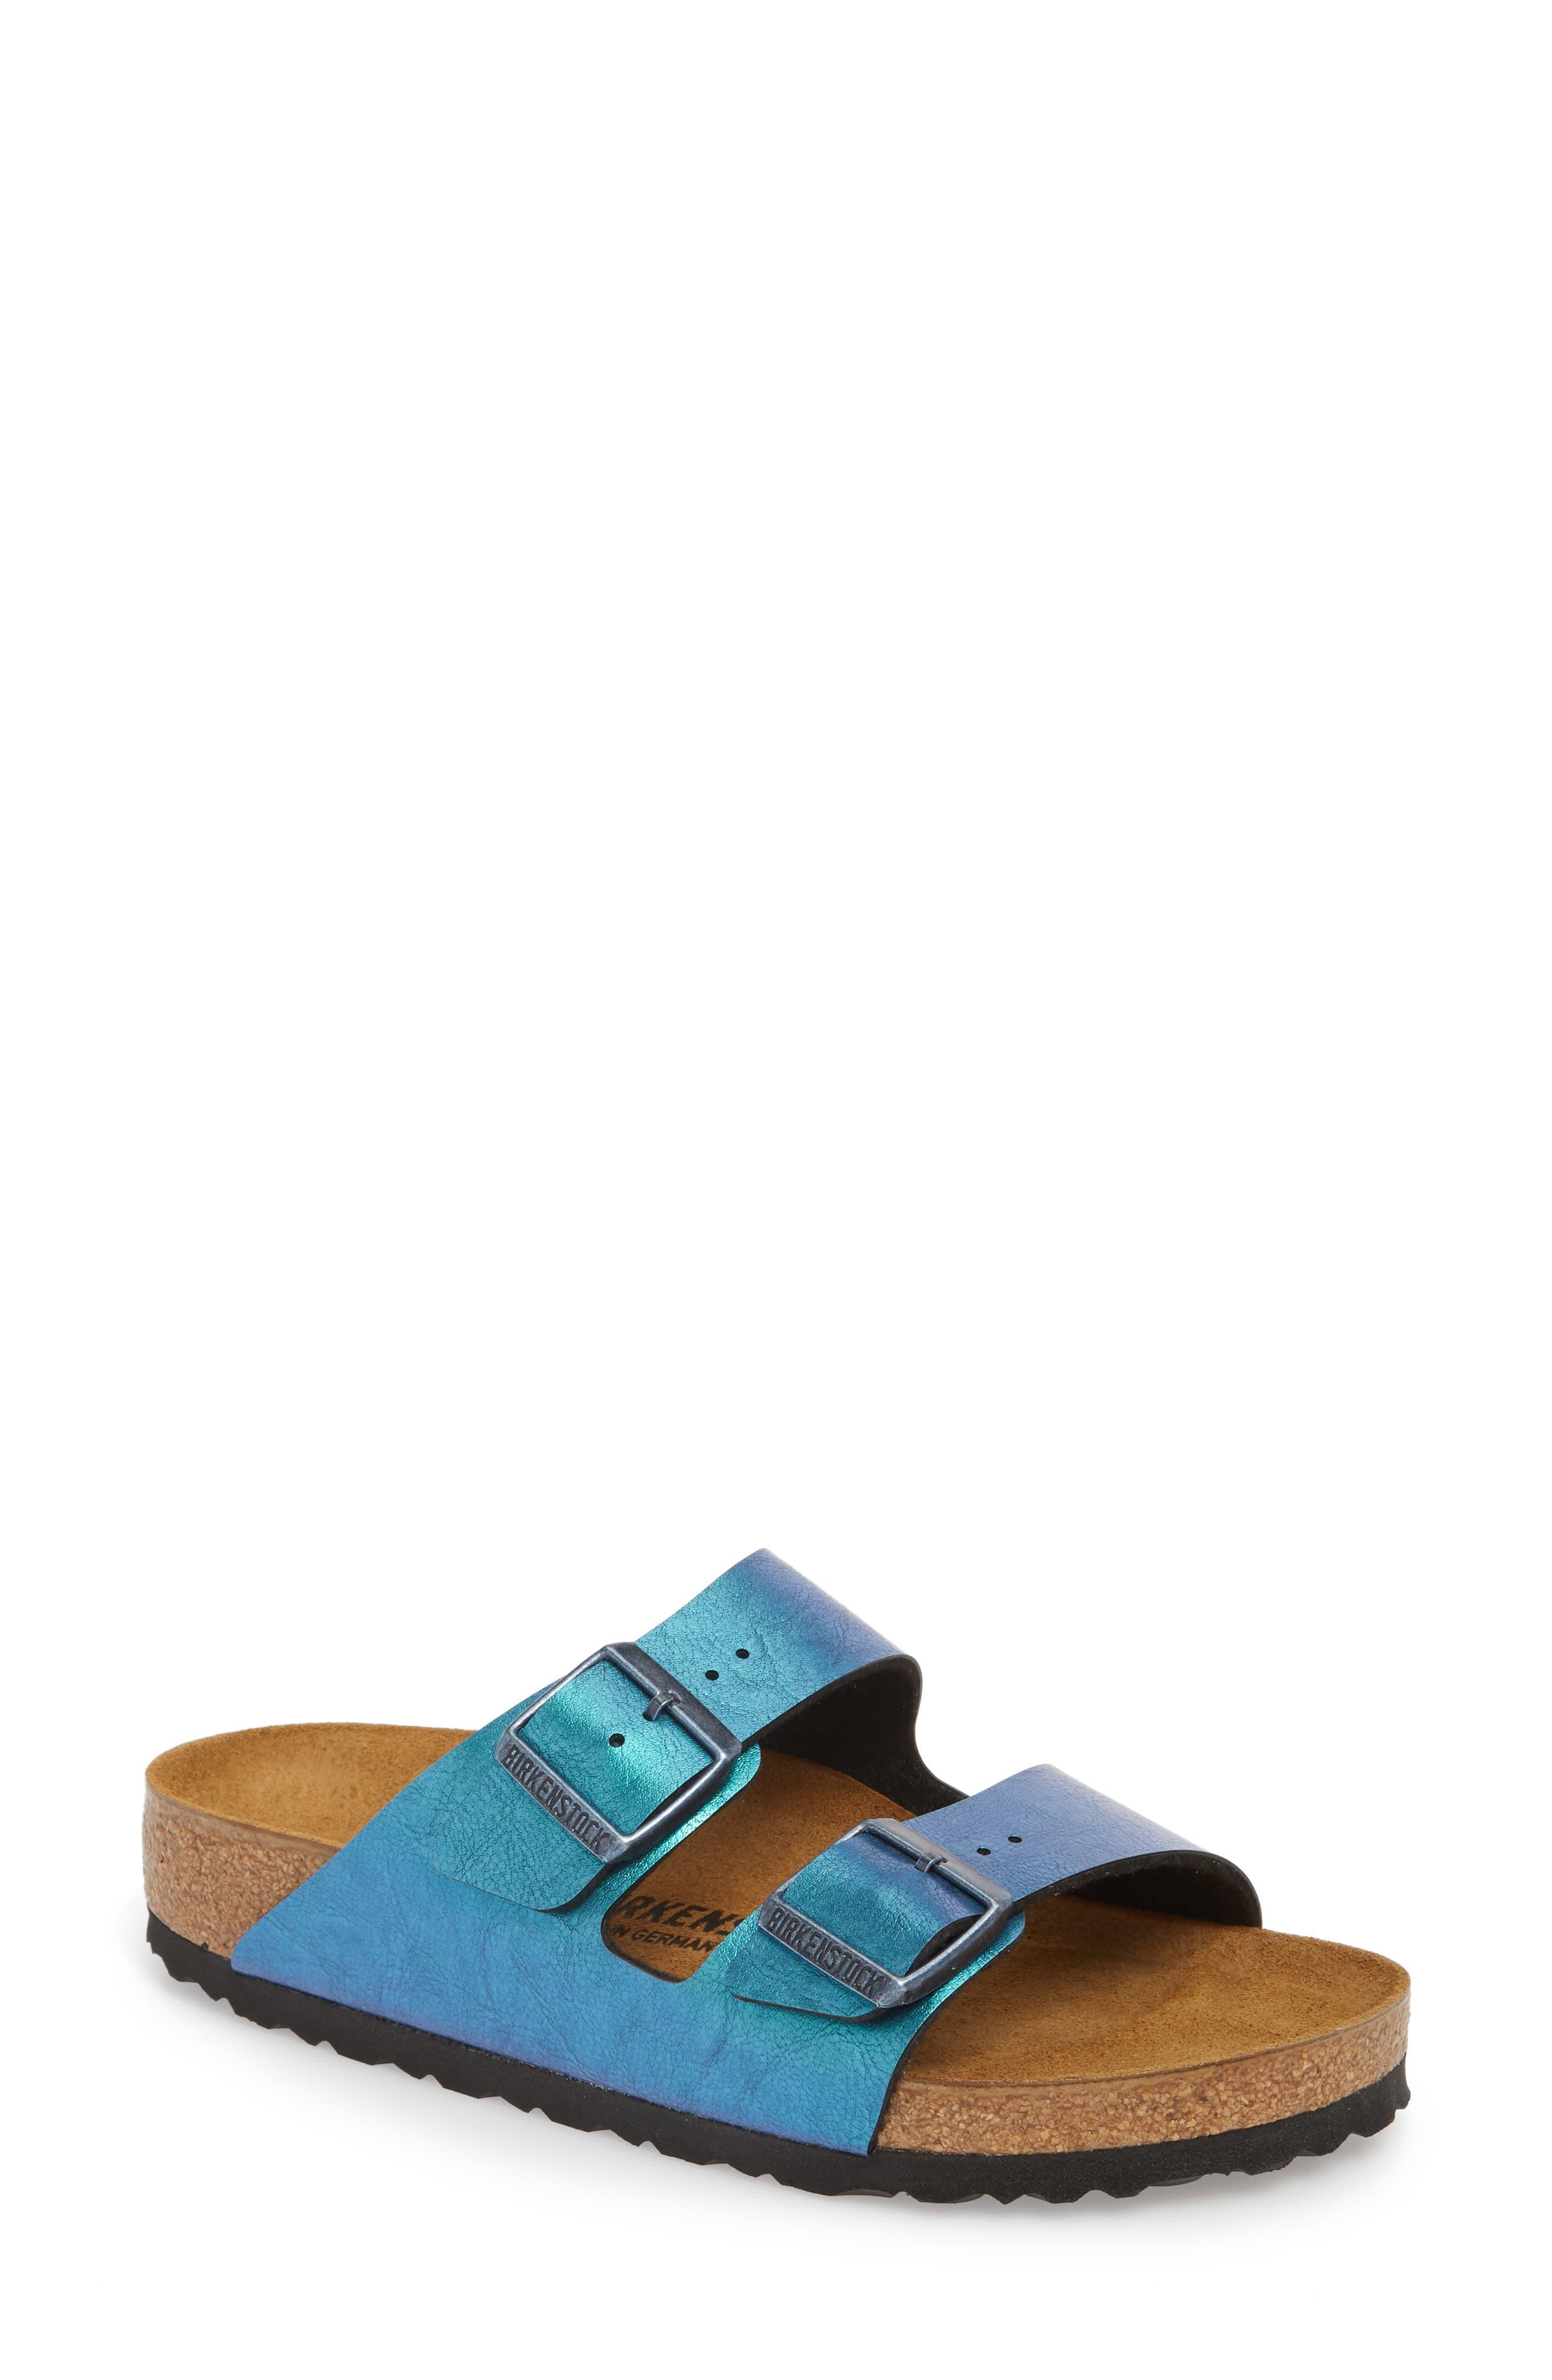 Arizona Graceful Birko-Flor<sup>™</sup> Sandal,                         Main,                         color, 400